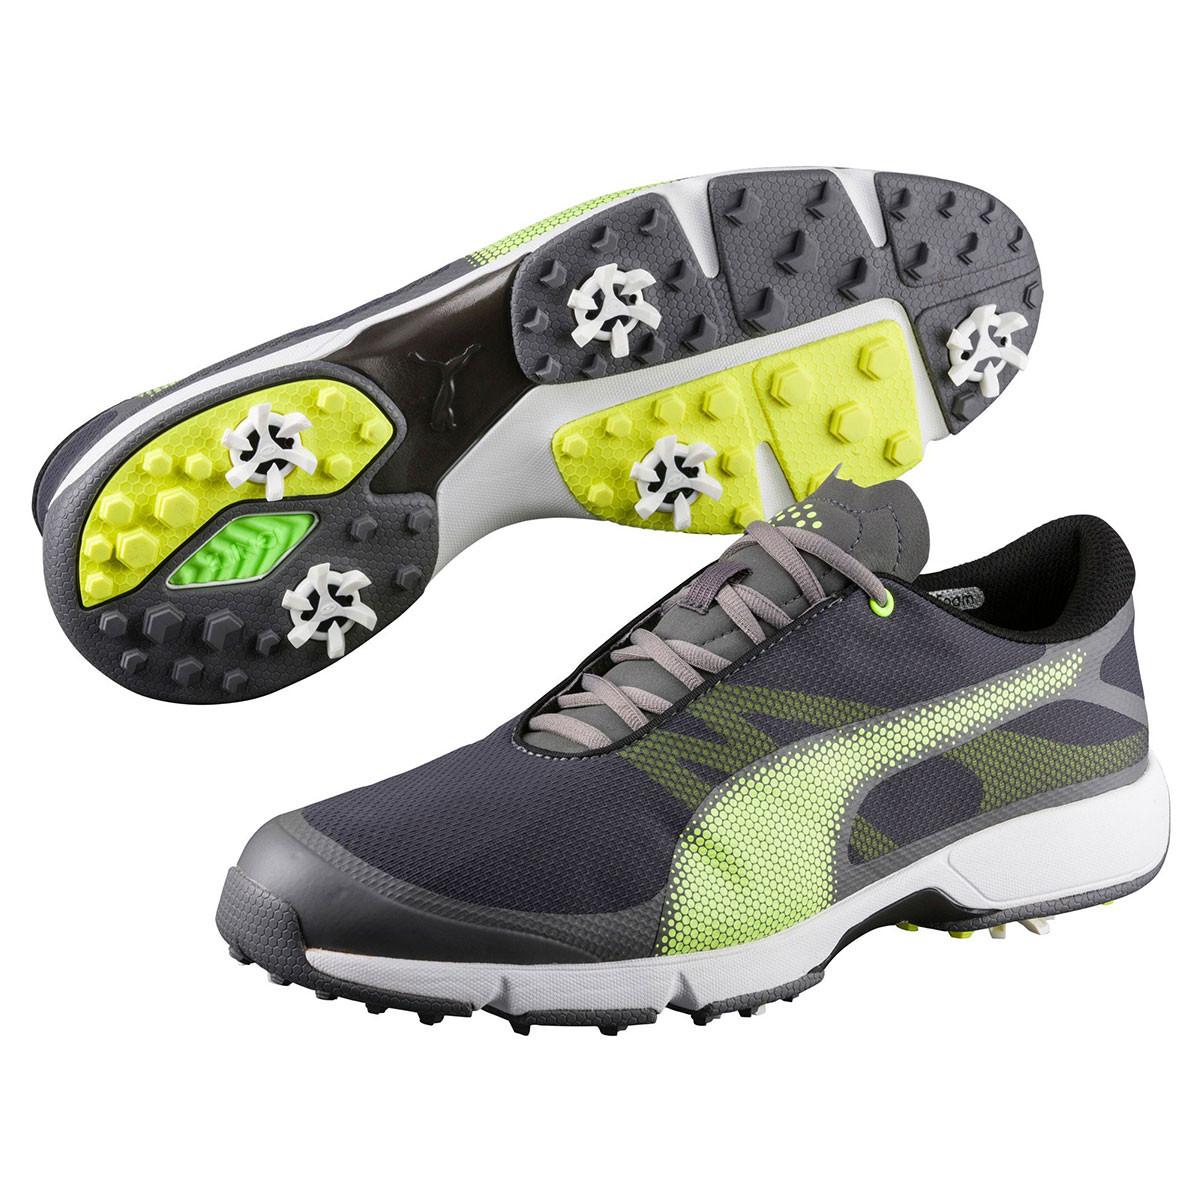 98b6be355 Puma Mens Ignite Drive Sport Waterproof Golf Shoes